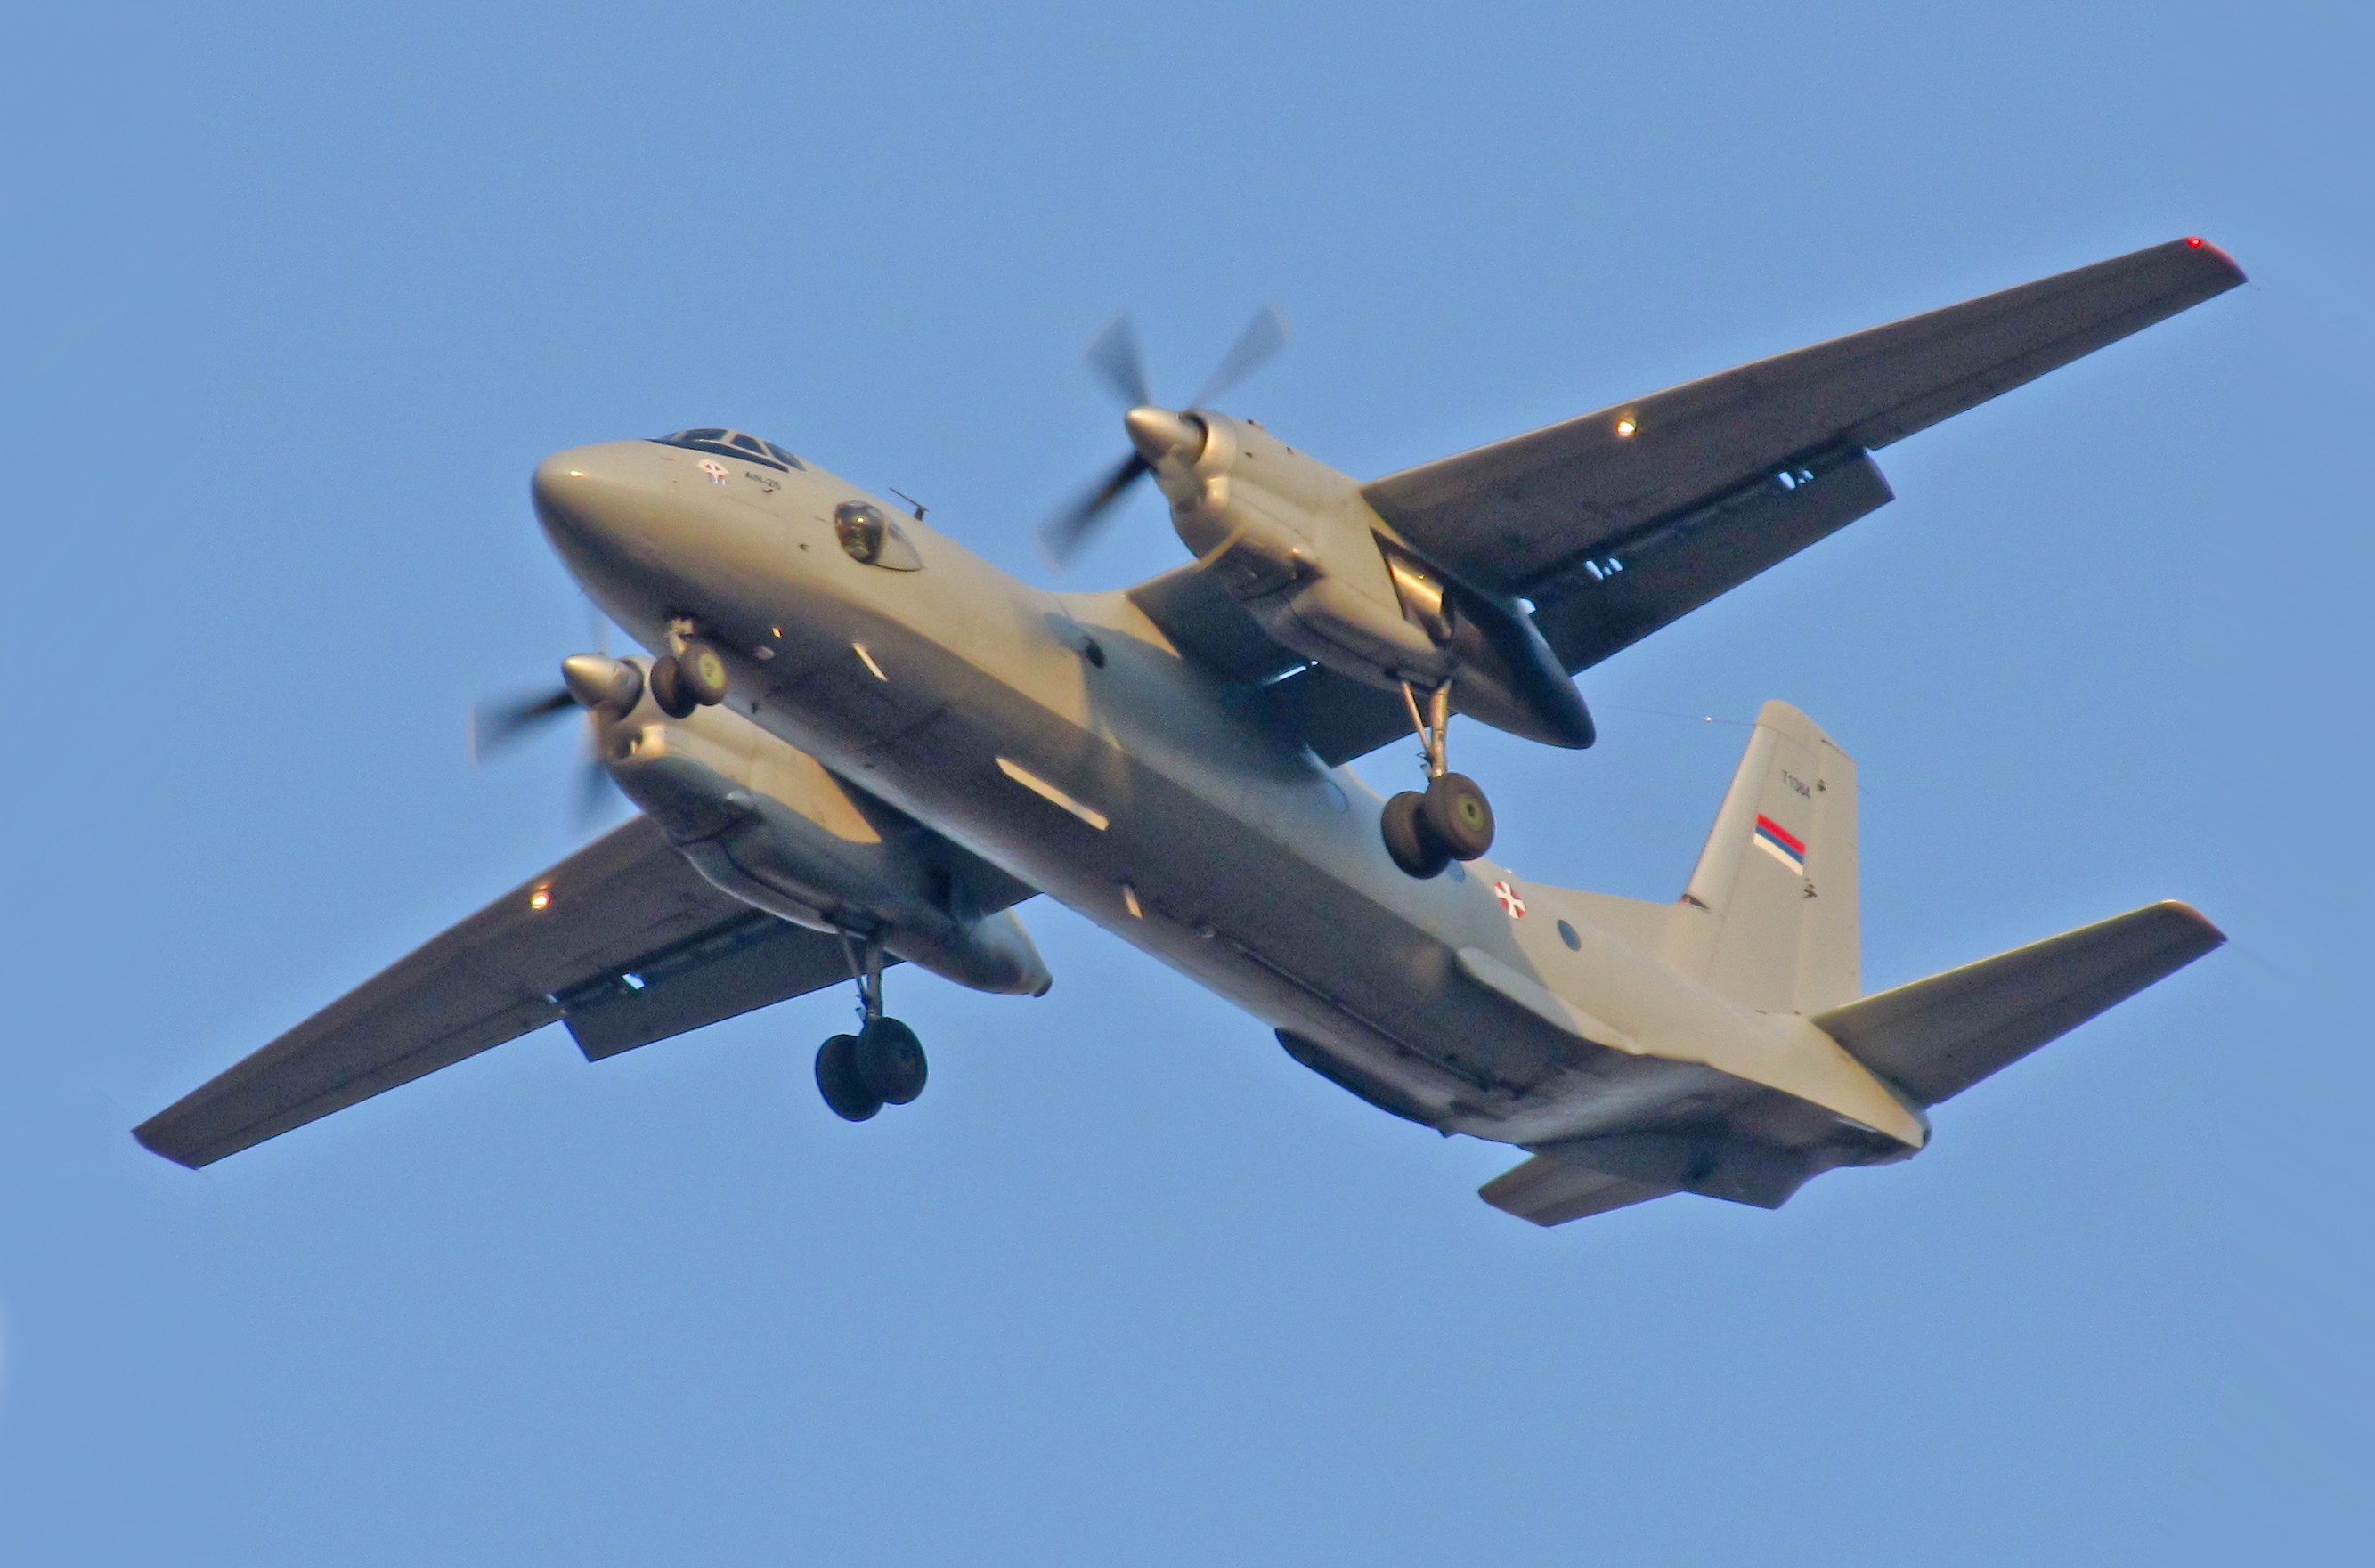 Antonov An-26 - Wikipedia